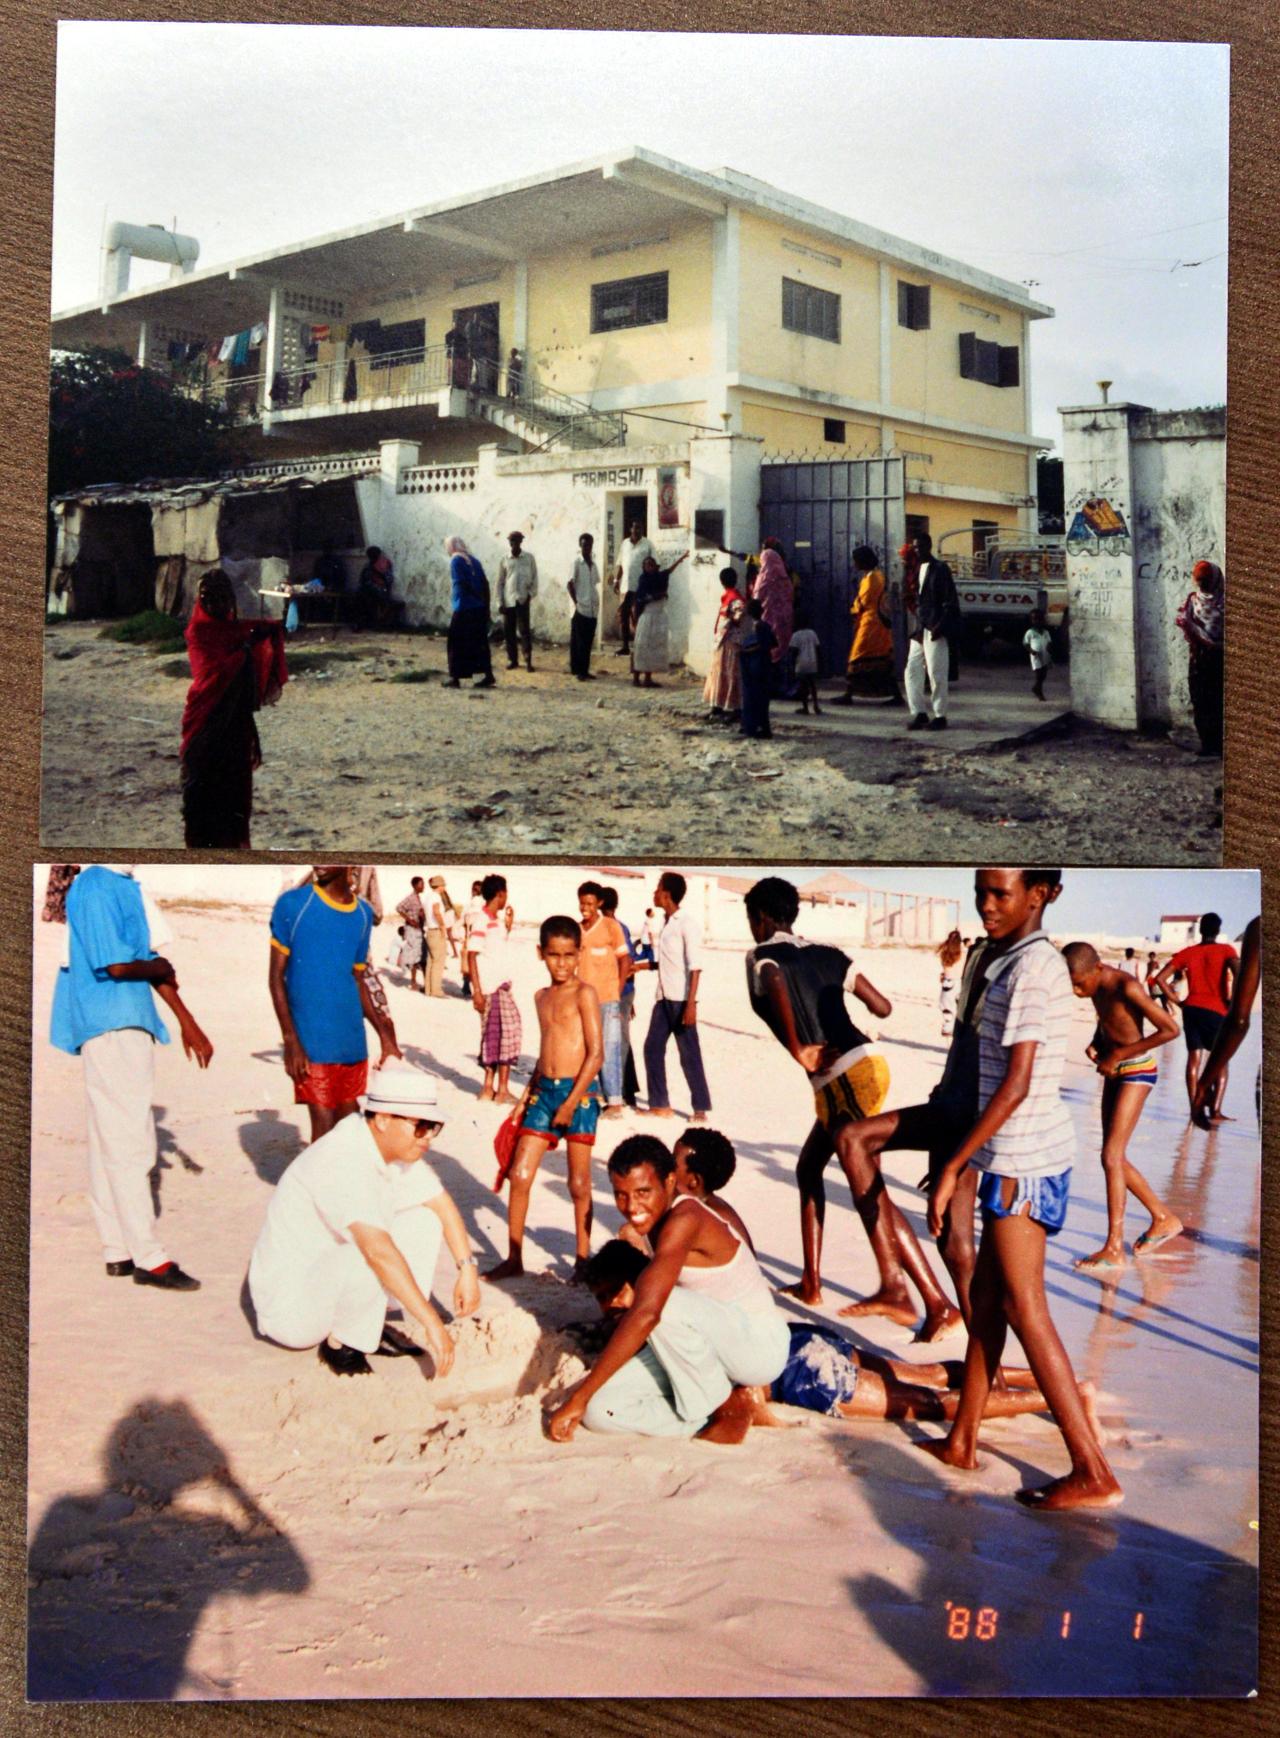 Photos from Ambassdor Kang Shin-sung's time serving in Somalia before the civil war Courtesy of Kang Shin-sung